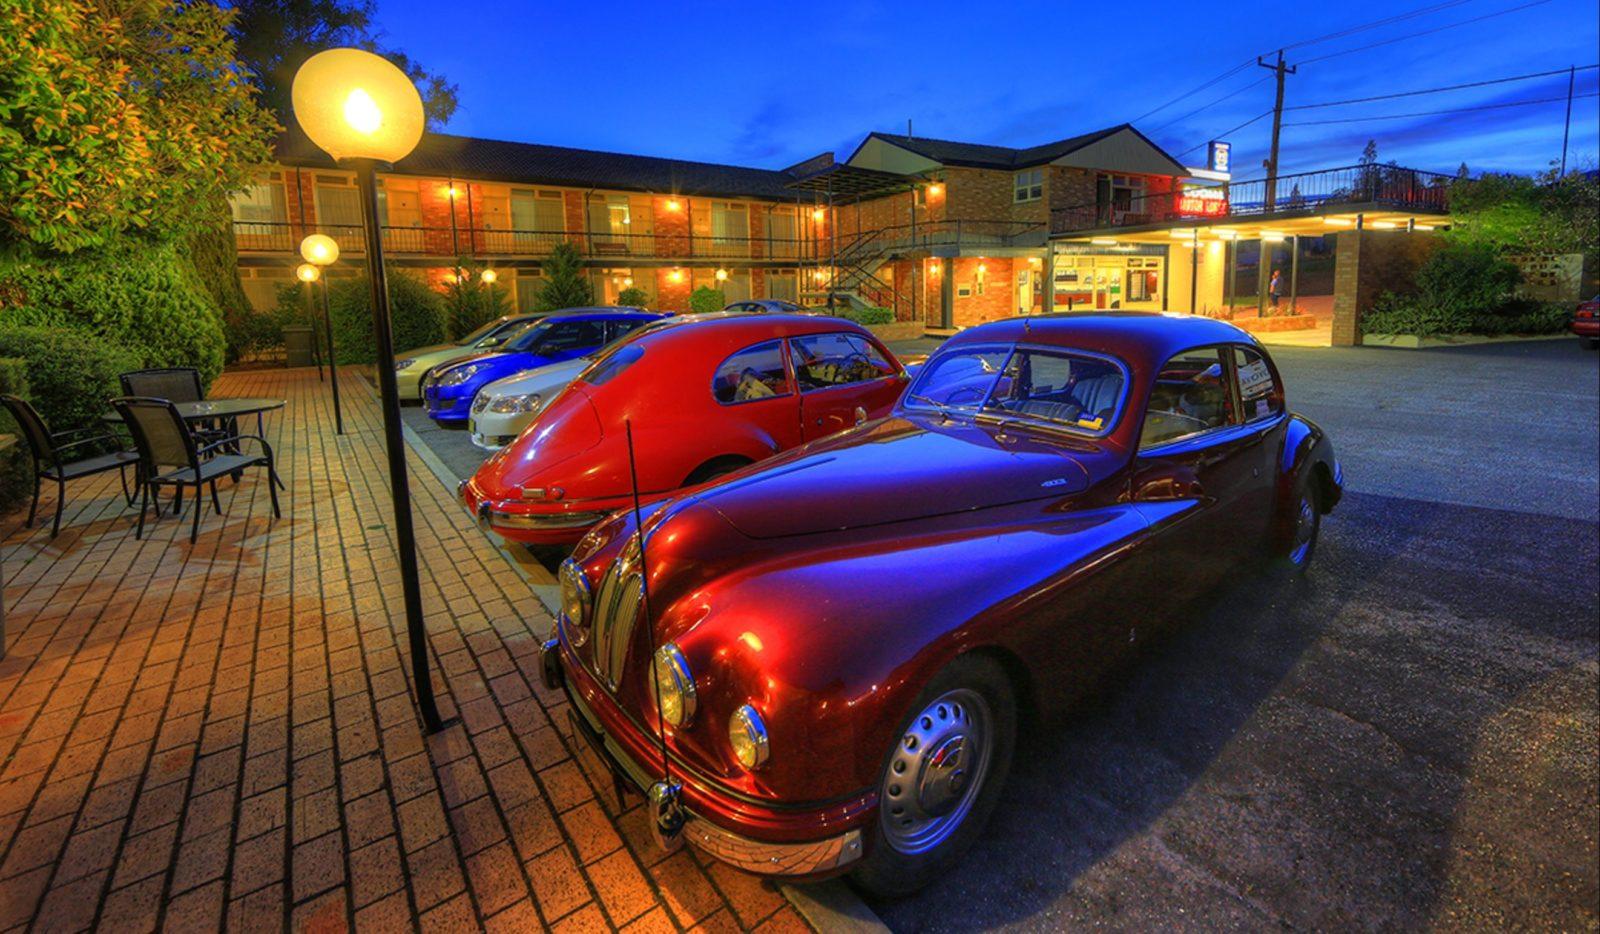 Cooma Motor Lodge